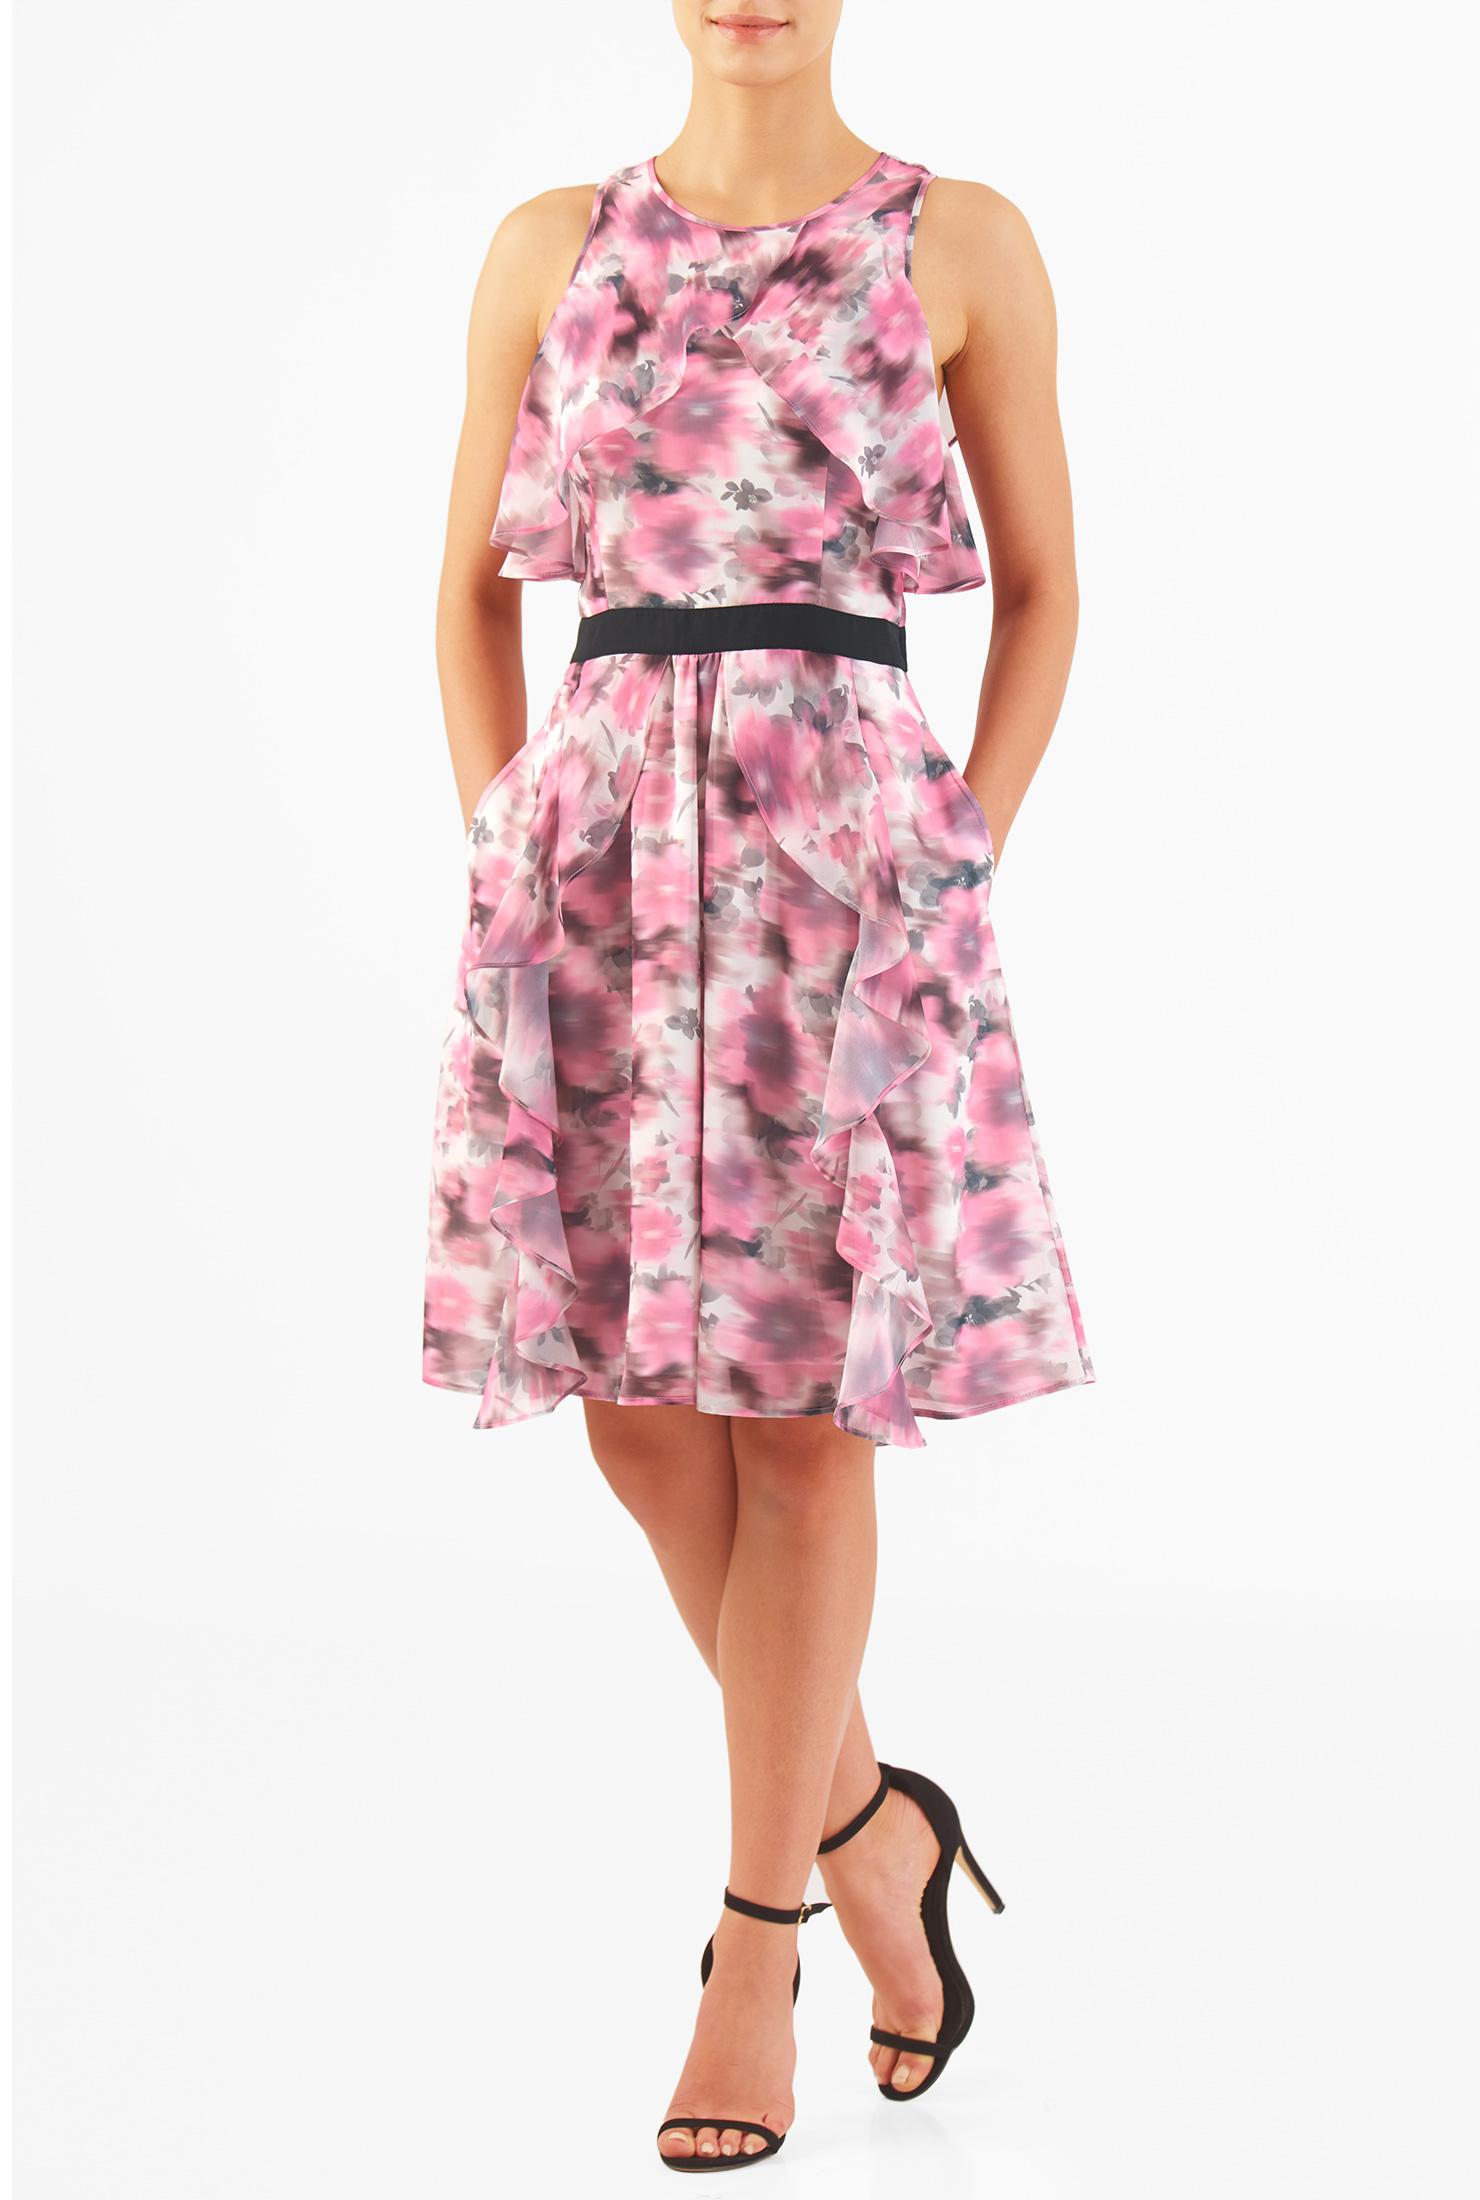 Eshakti Womens Floral Wash Print Ruffle Georgette Dress